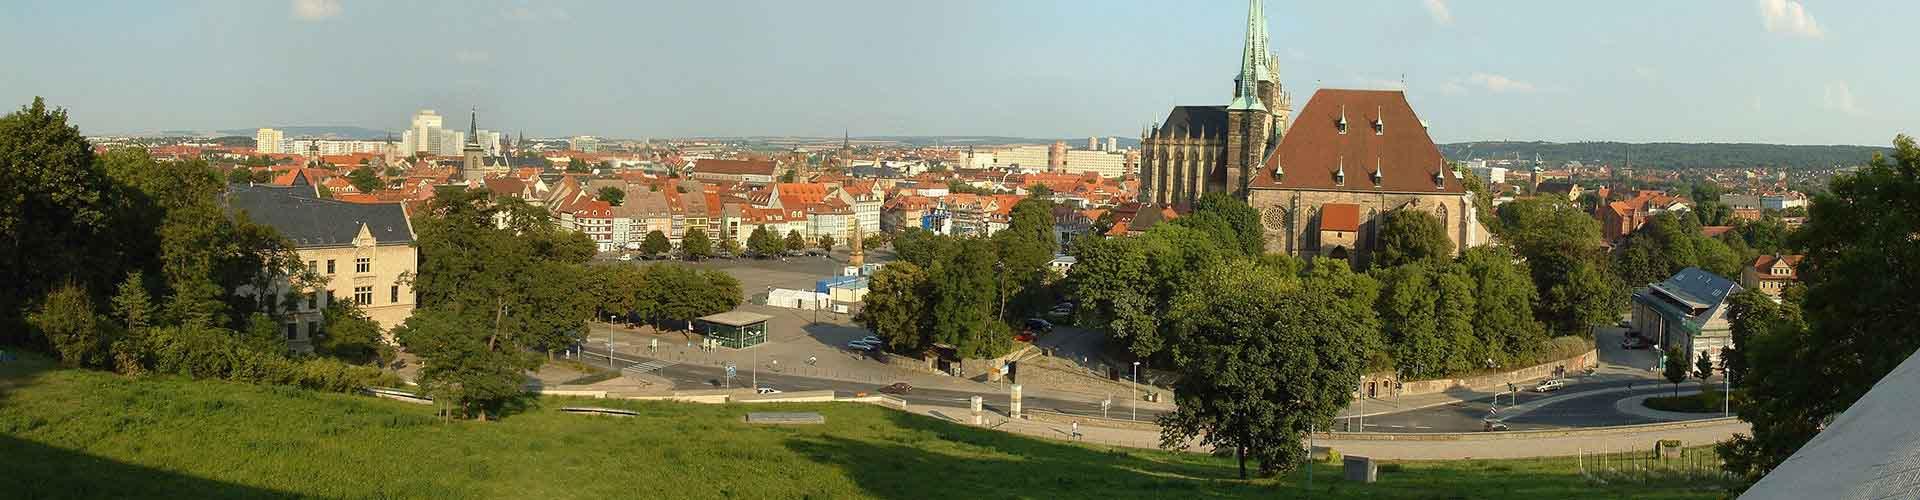 Erfurt – Hotéis em Erfurt. Mapas para Erfurt, Fotos e Avaliações para cada Hotel Erfurt.